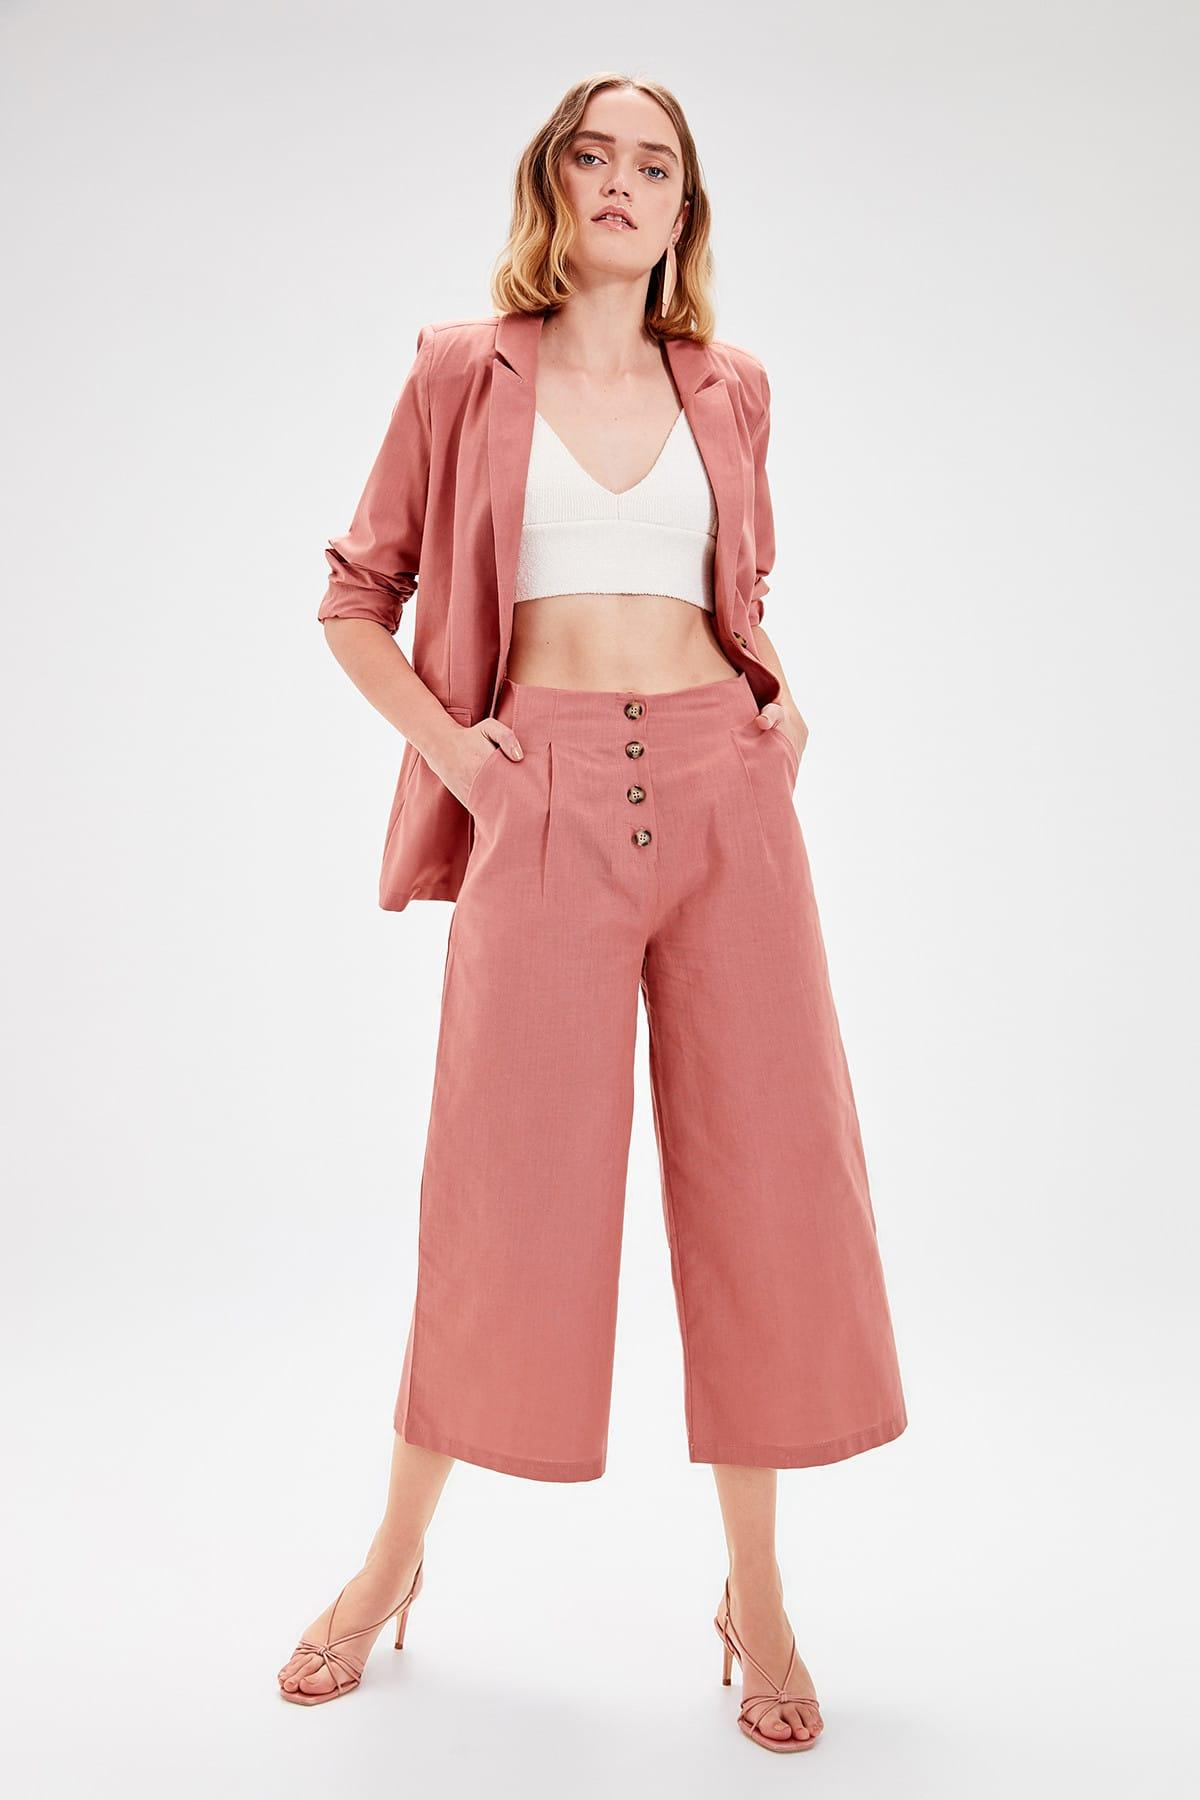 Trendyol Color Rose Loose Cut Pants TWOAW20PL0026